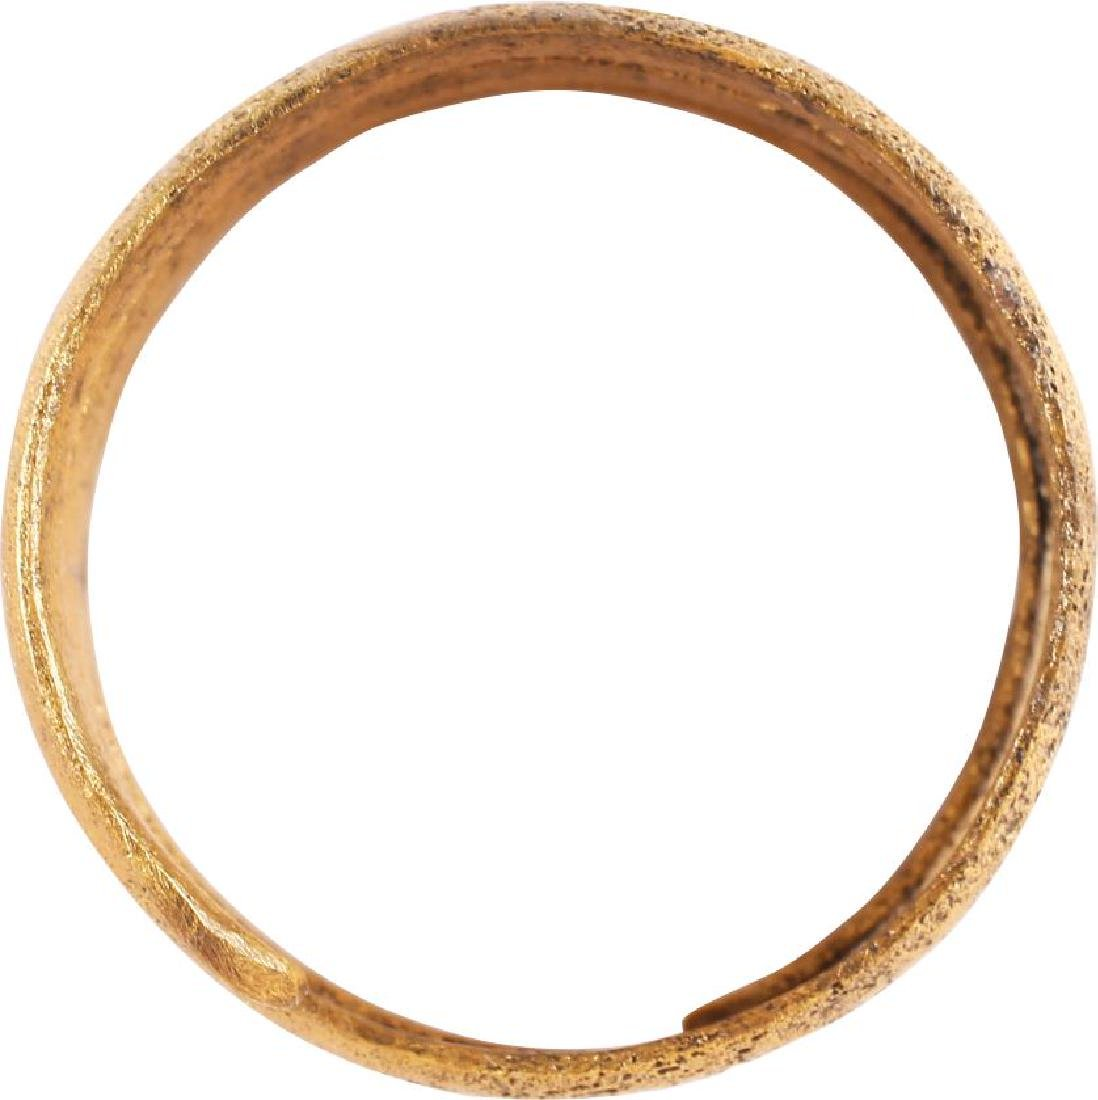 FINE VIKING COIL RING, 10th CENTURY AD - 2